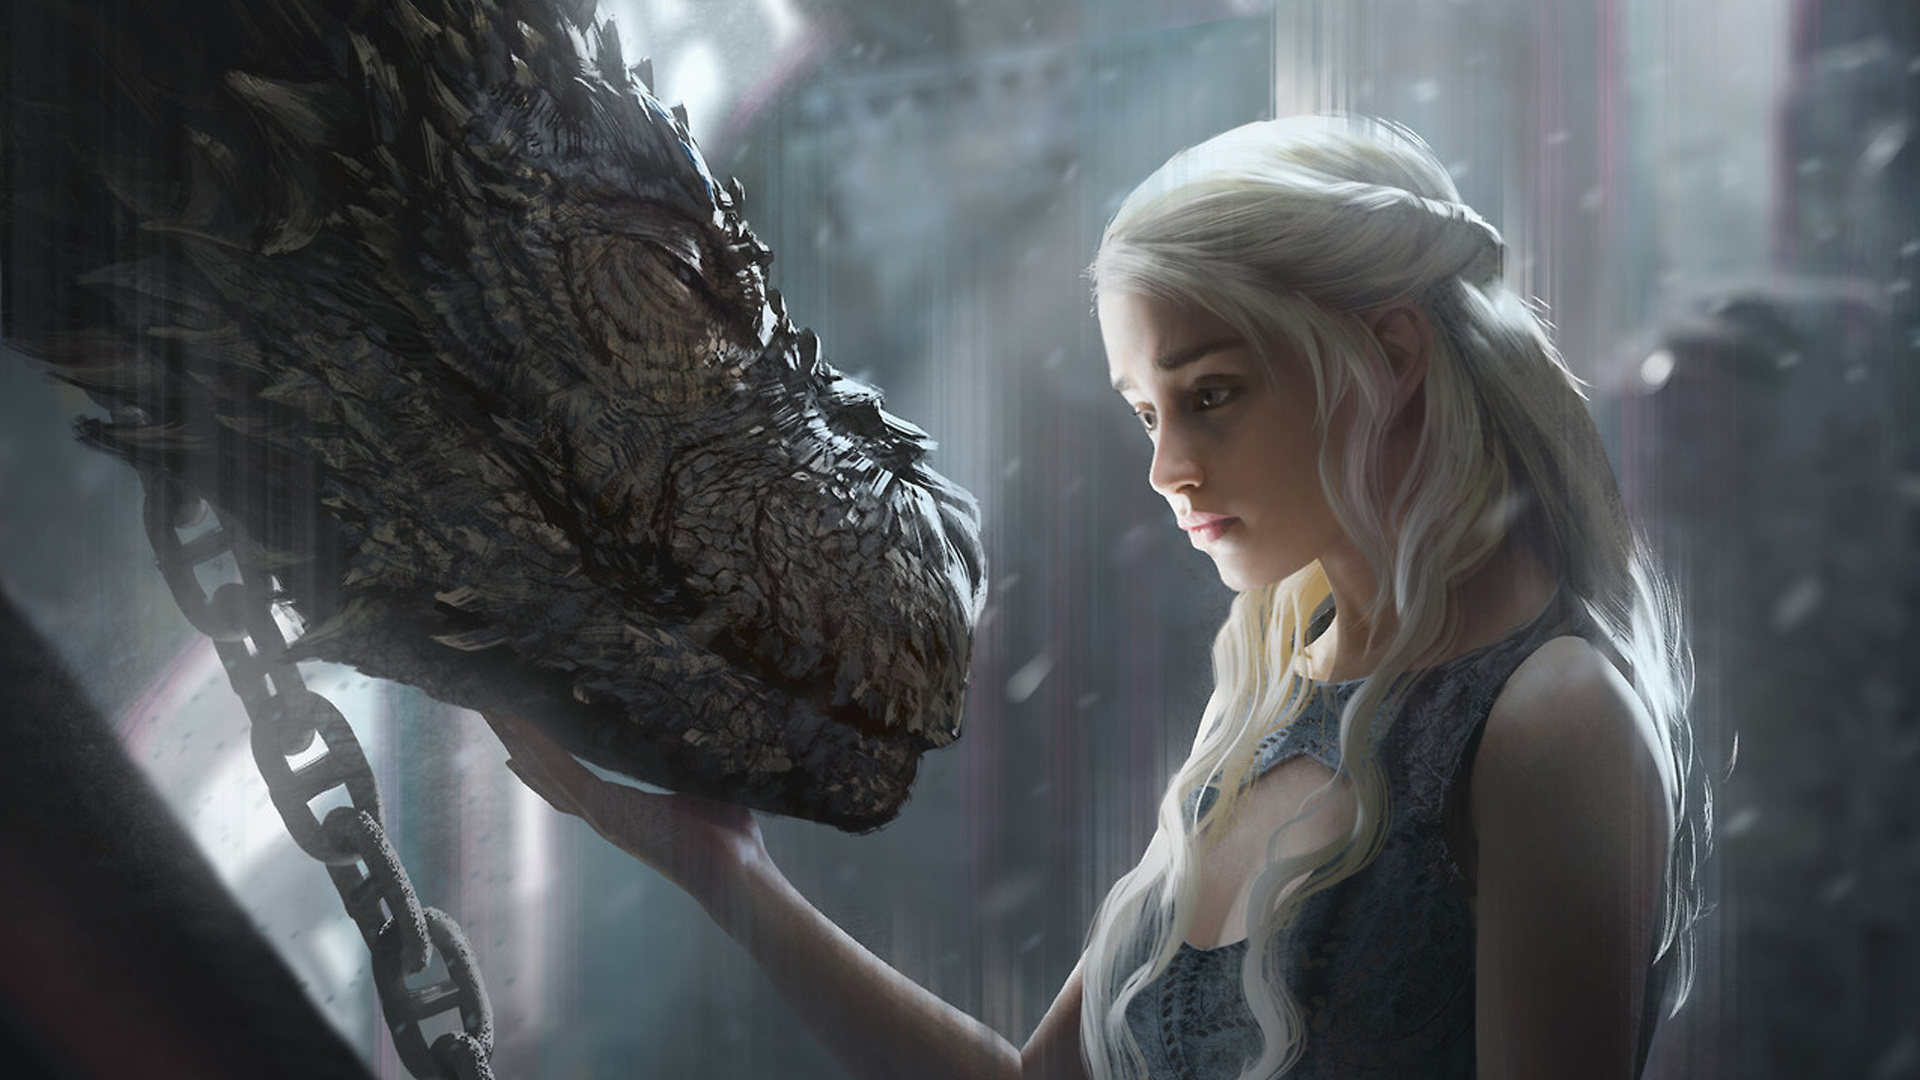 1920x1080 Daenerys Targaryen With Dragon Artwork Laptop Full Hd